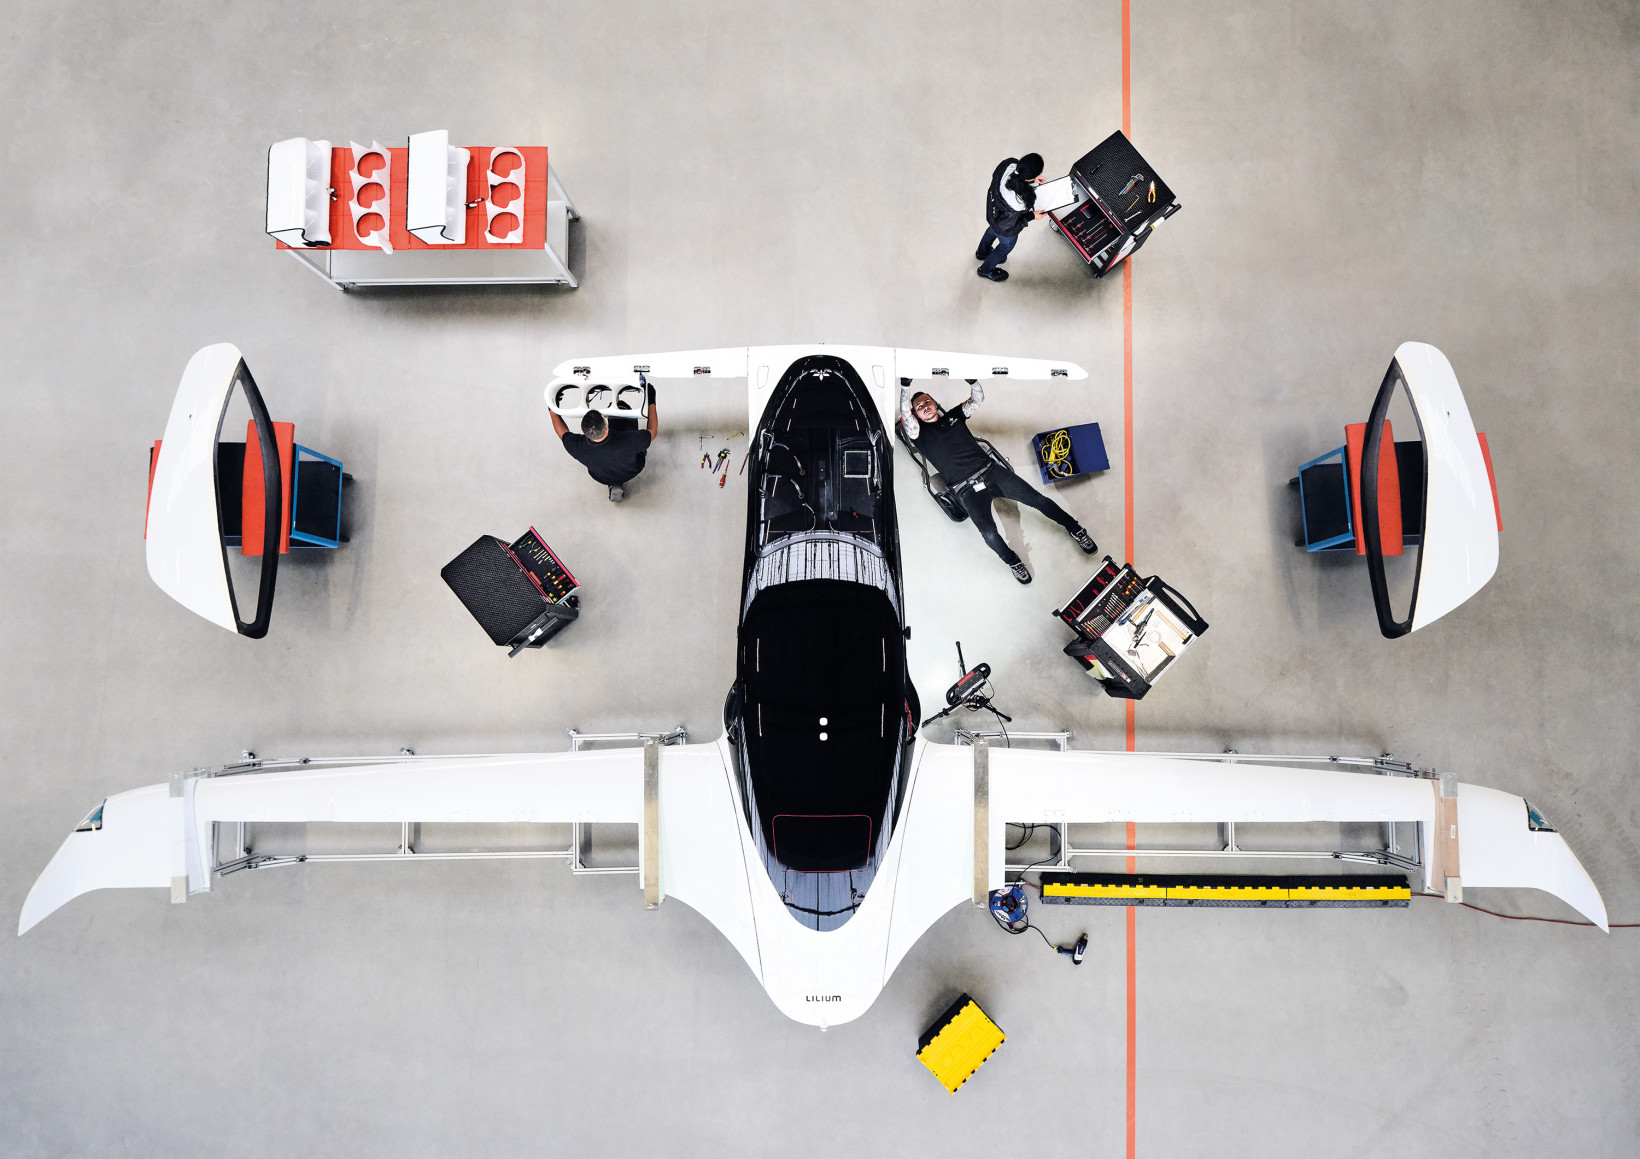 lilium, evtol, taxi, flying, drone